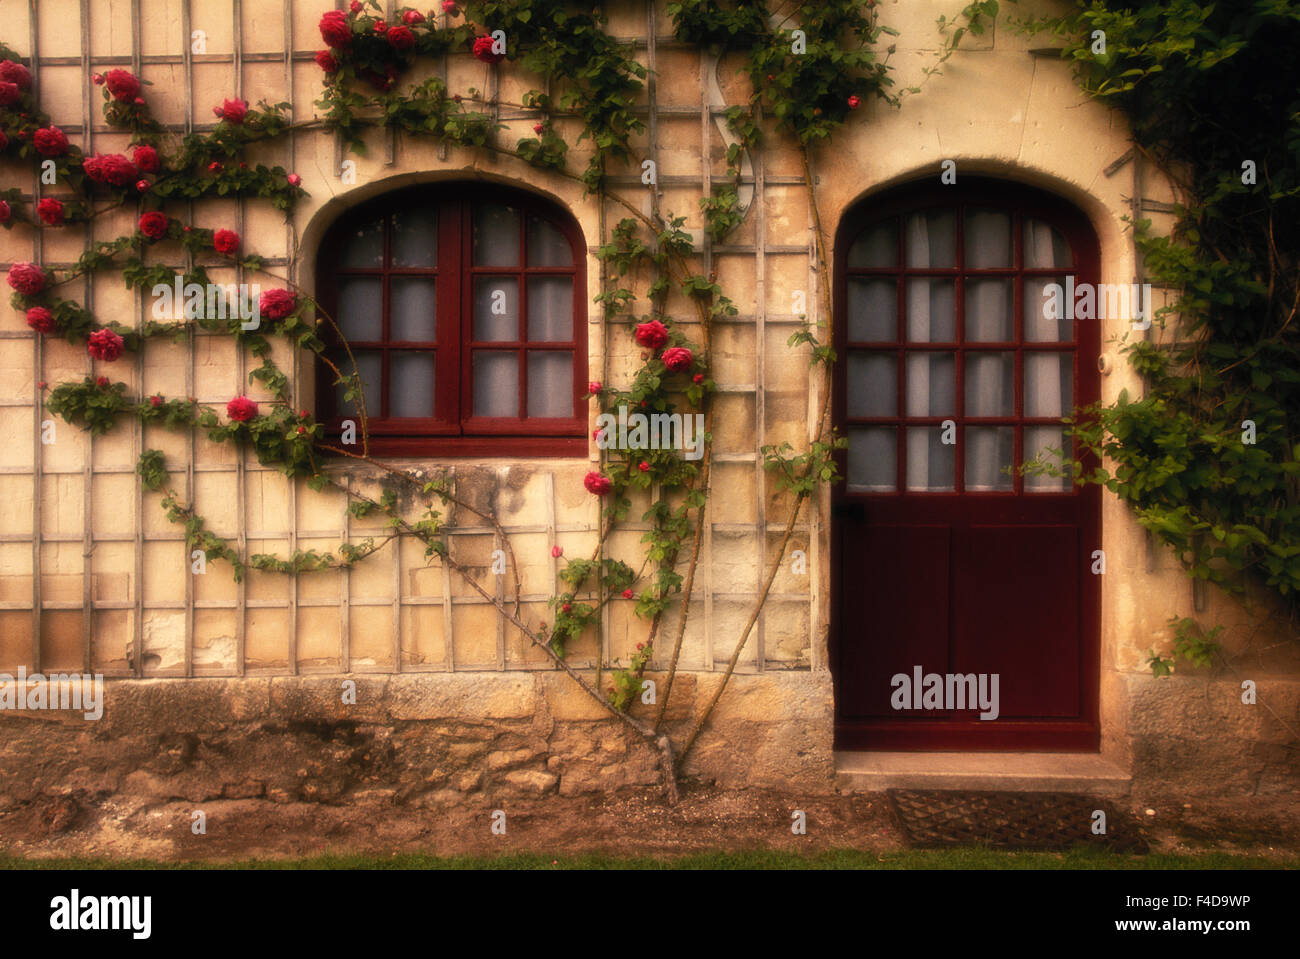 France, Indre-et-Loire, Loire Valley, Chateau de Chenonceau, Doorway of rose cottage. (Large format sizes available) - Stock Image